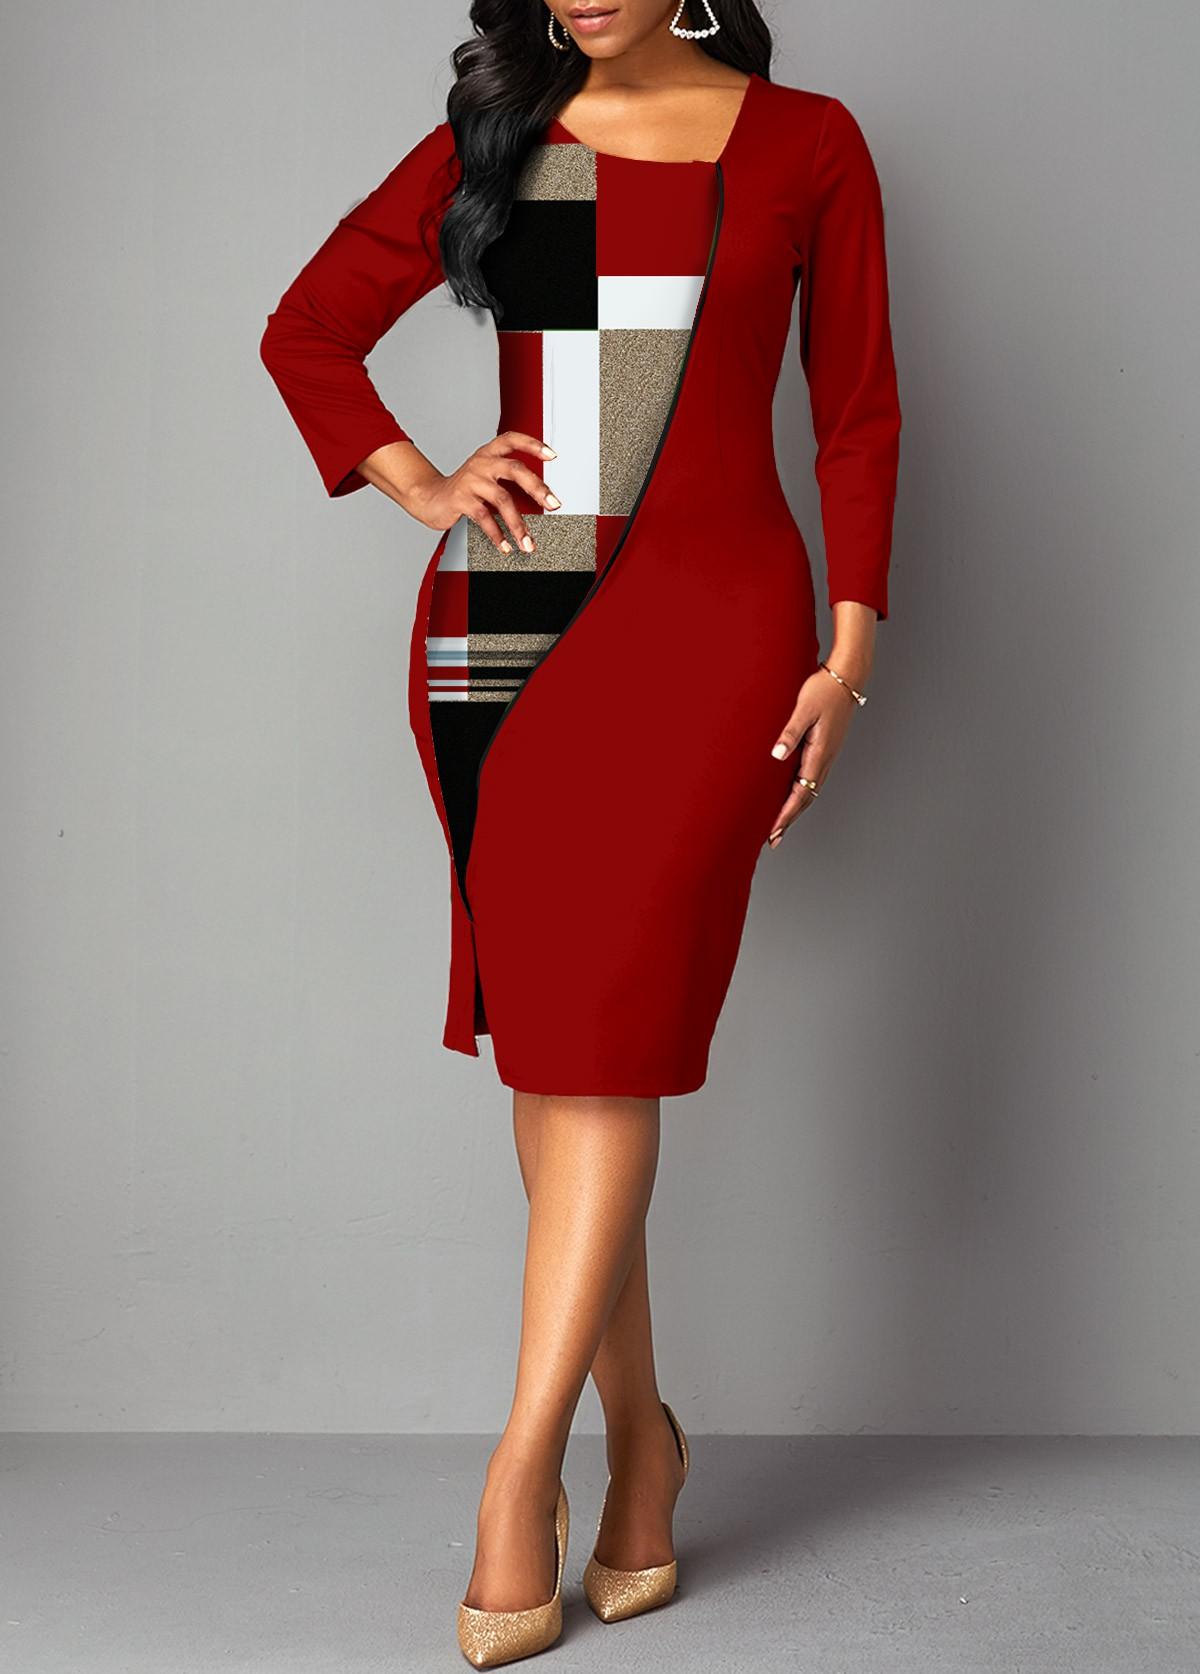 ROTITA 3/4 Sleeve Plaid Side Slit Bodycon Dress